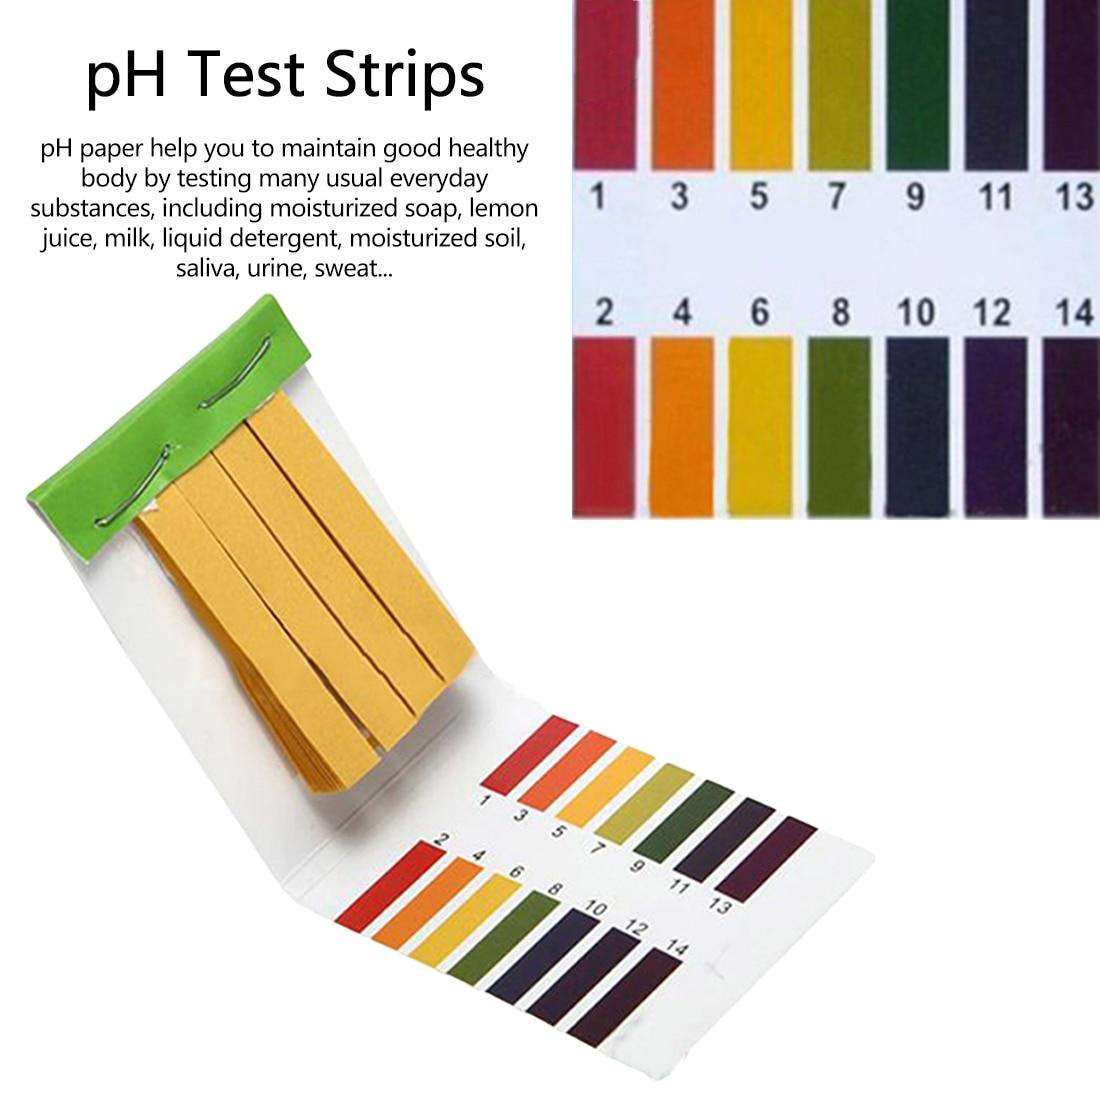 80 Strips/pack PH Test Strips Full PH Meter PH Controller 1-14st Indicator Litmus Paper Water Soil Sting Kit